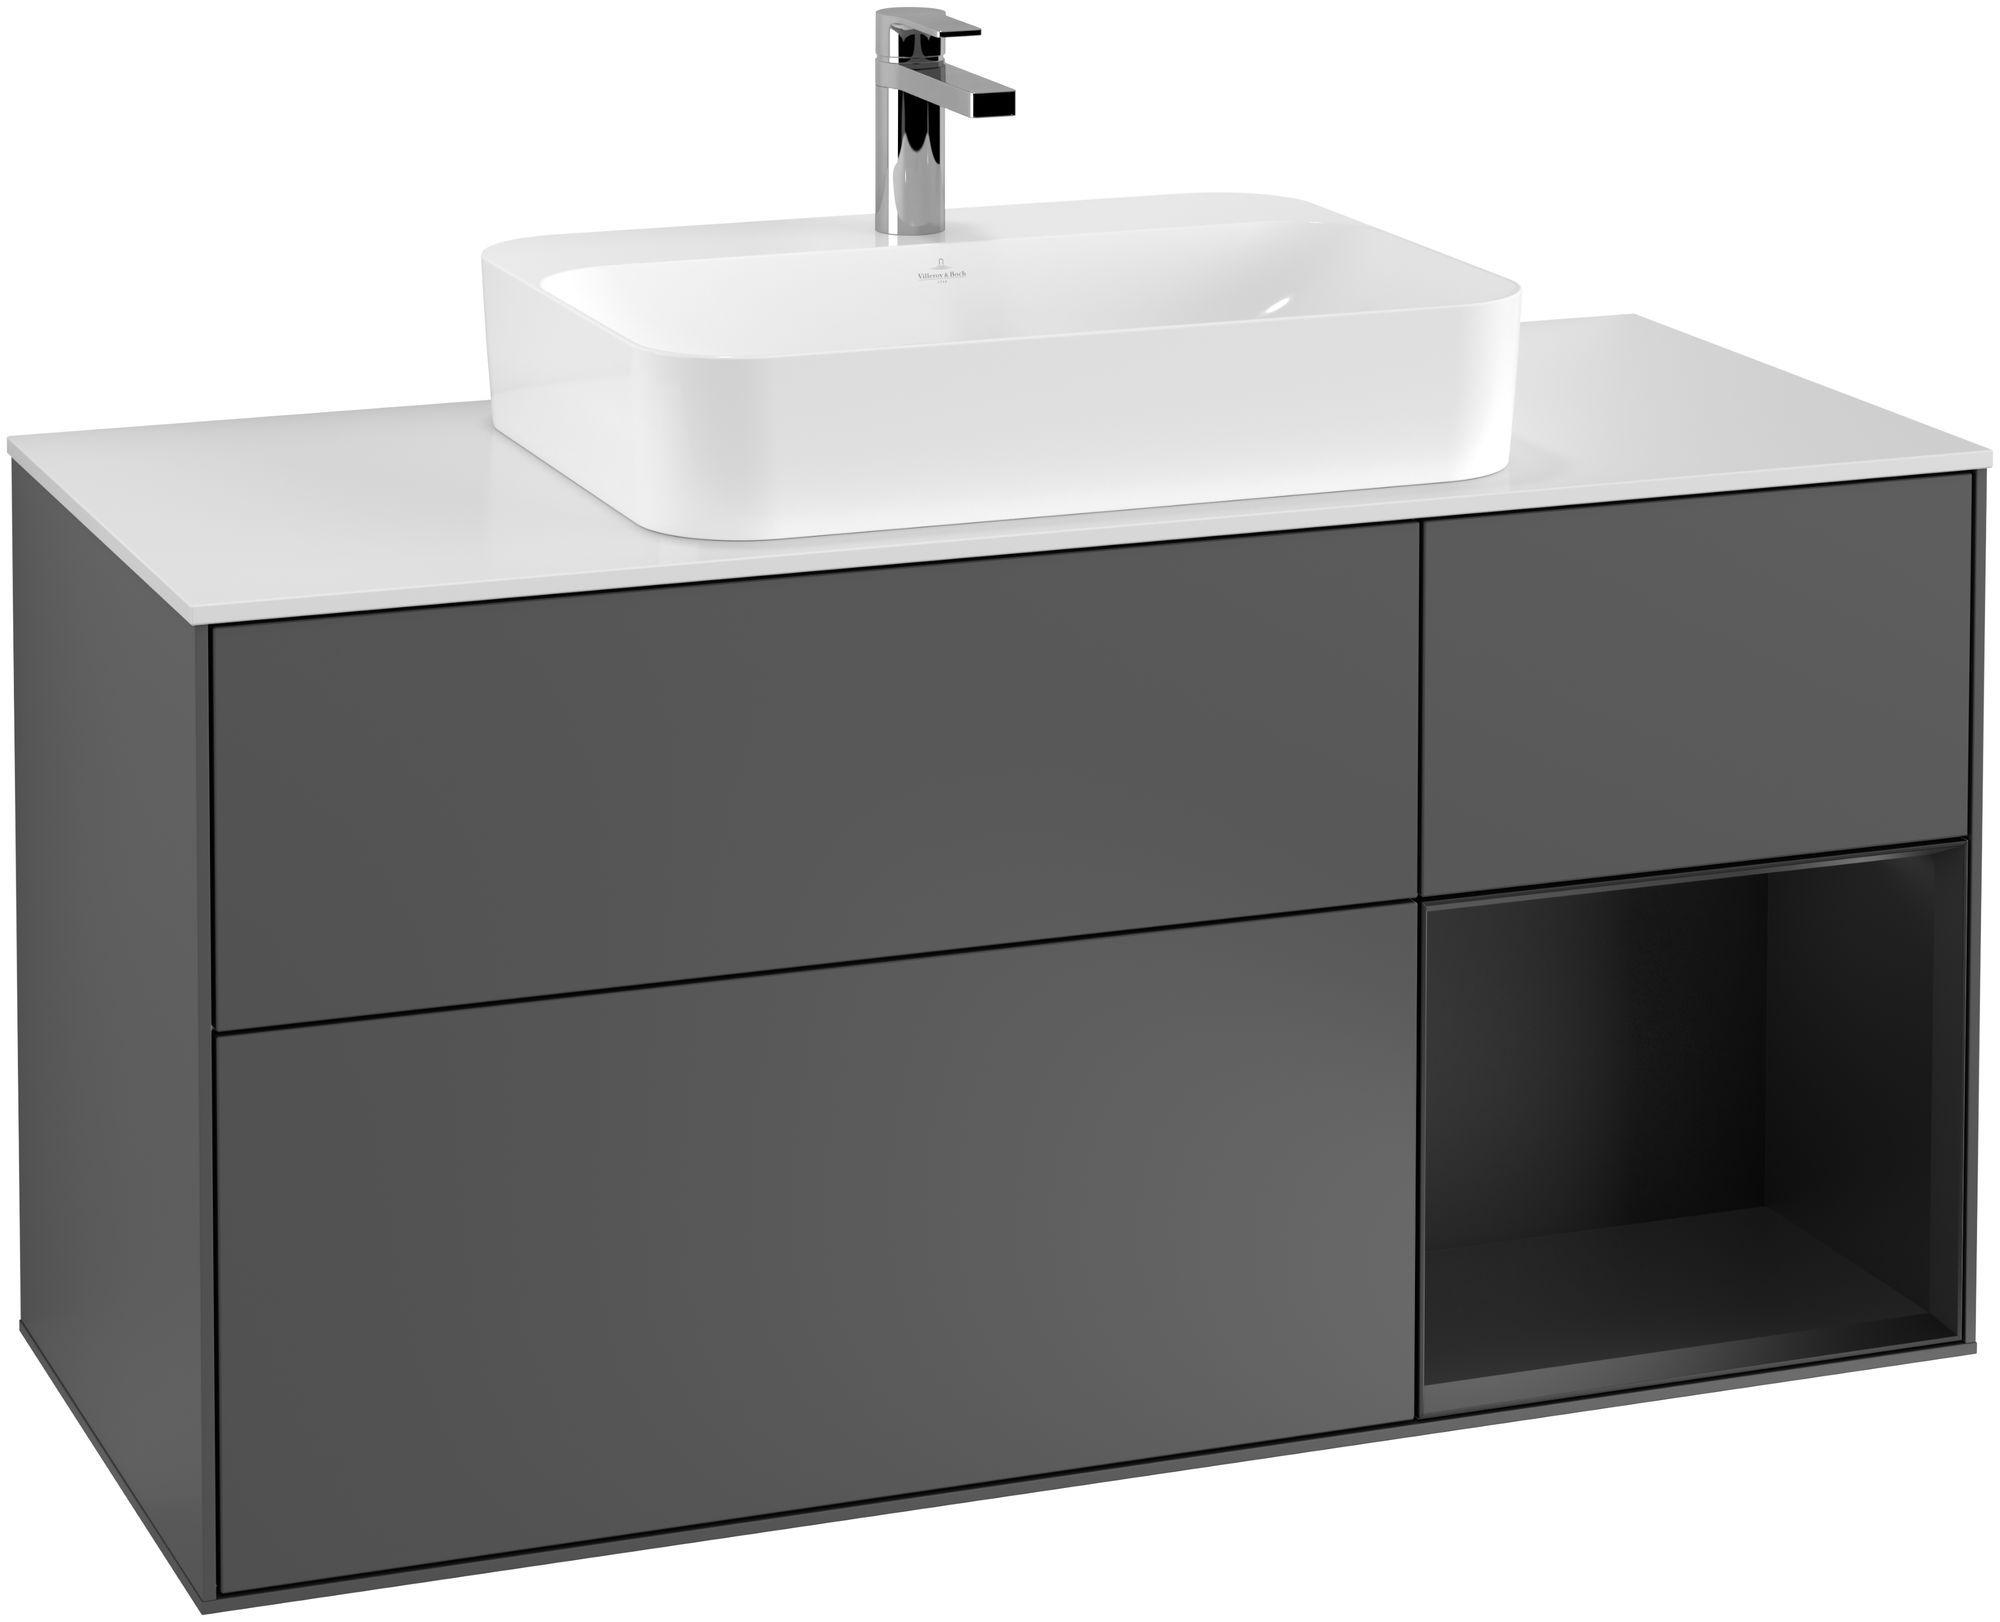 Villeroy & Boch Finion G42 Waschtischunterschrank mit Regalelement 3 Auszüge Waschtisch mittig LED-Beleuchtung B:120xH:60,3xT:50,1cm Front, Korpus: Anthracite Matt, Regal: Black Matt Lacquer, Glasplatte: White Matt G421PDGK